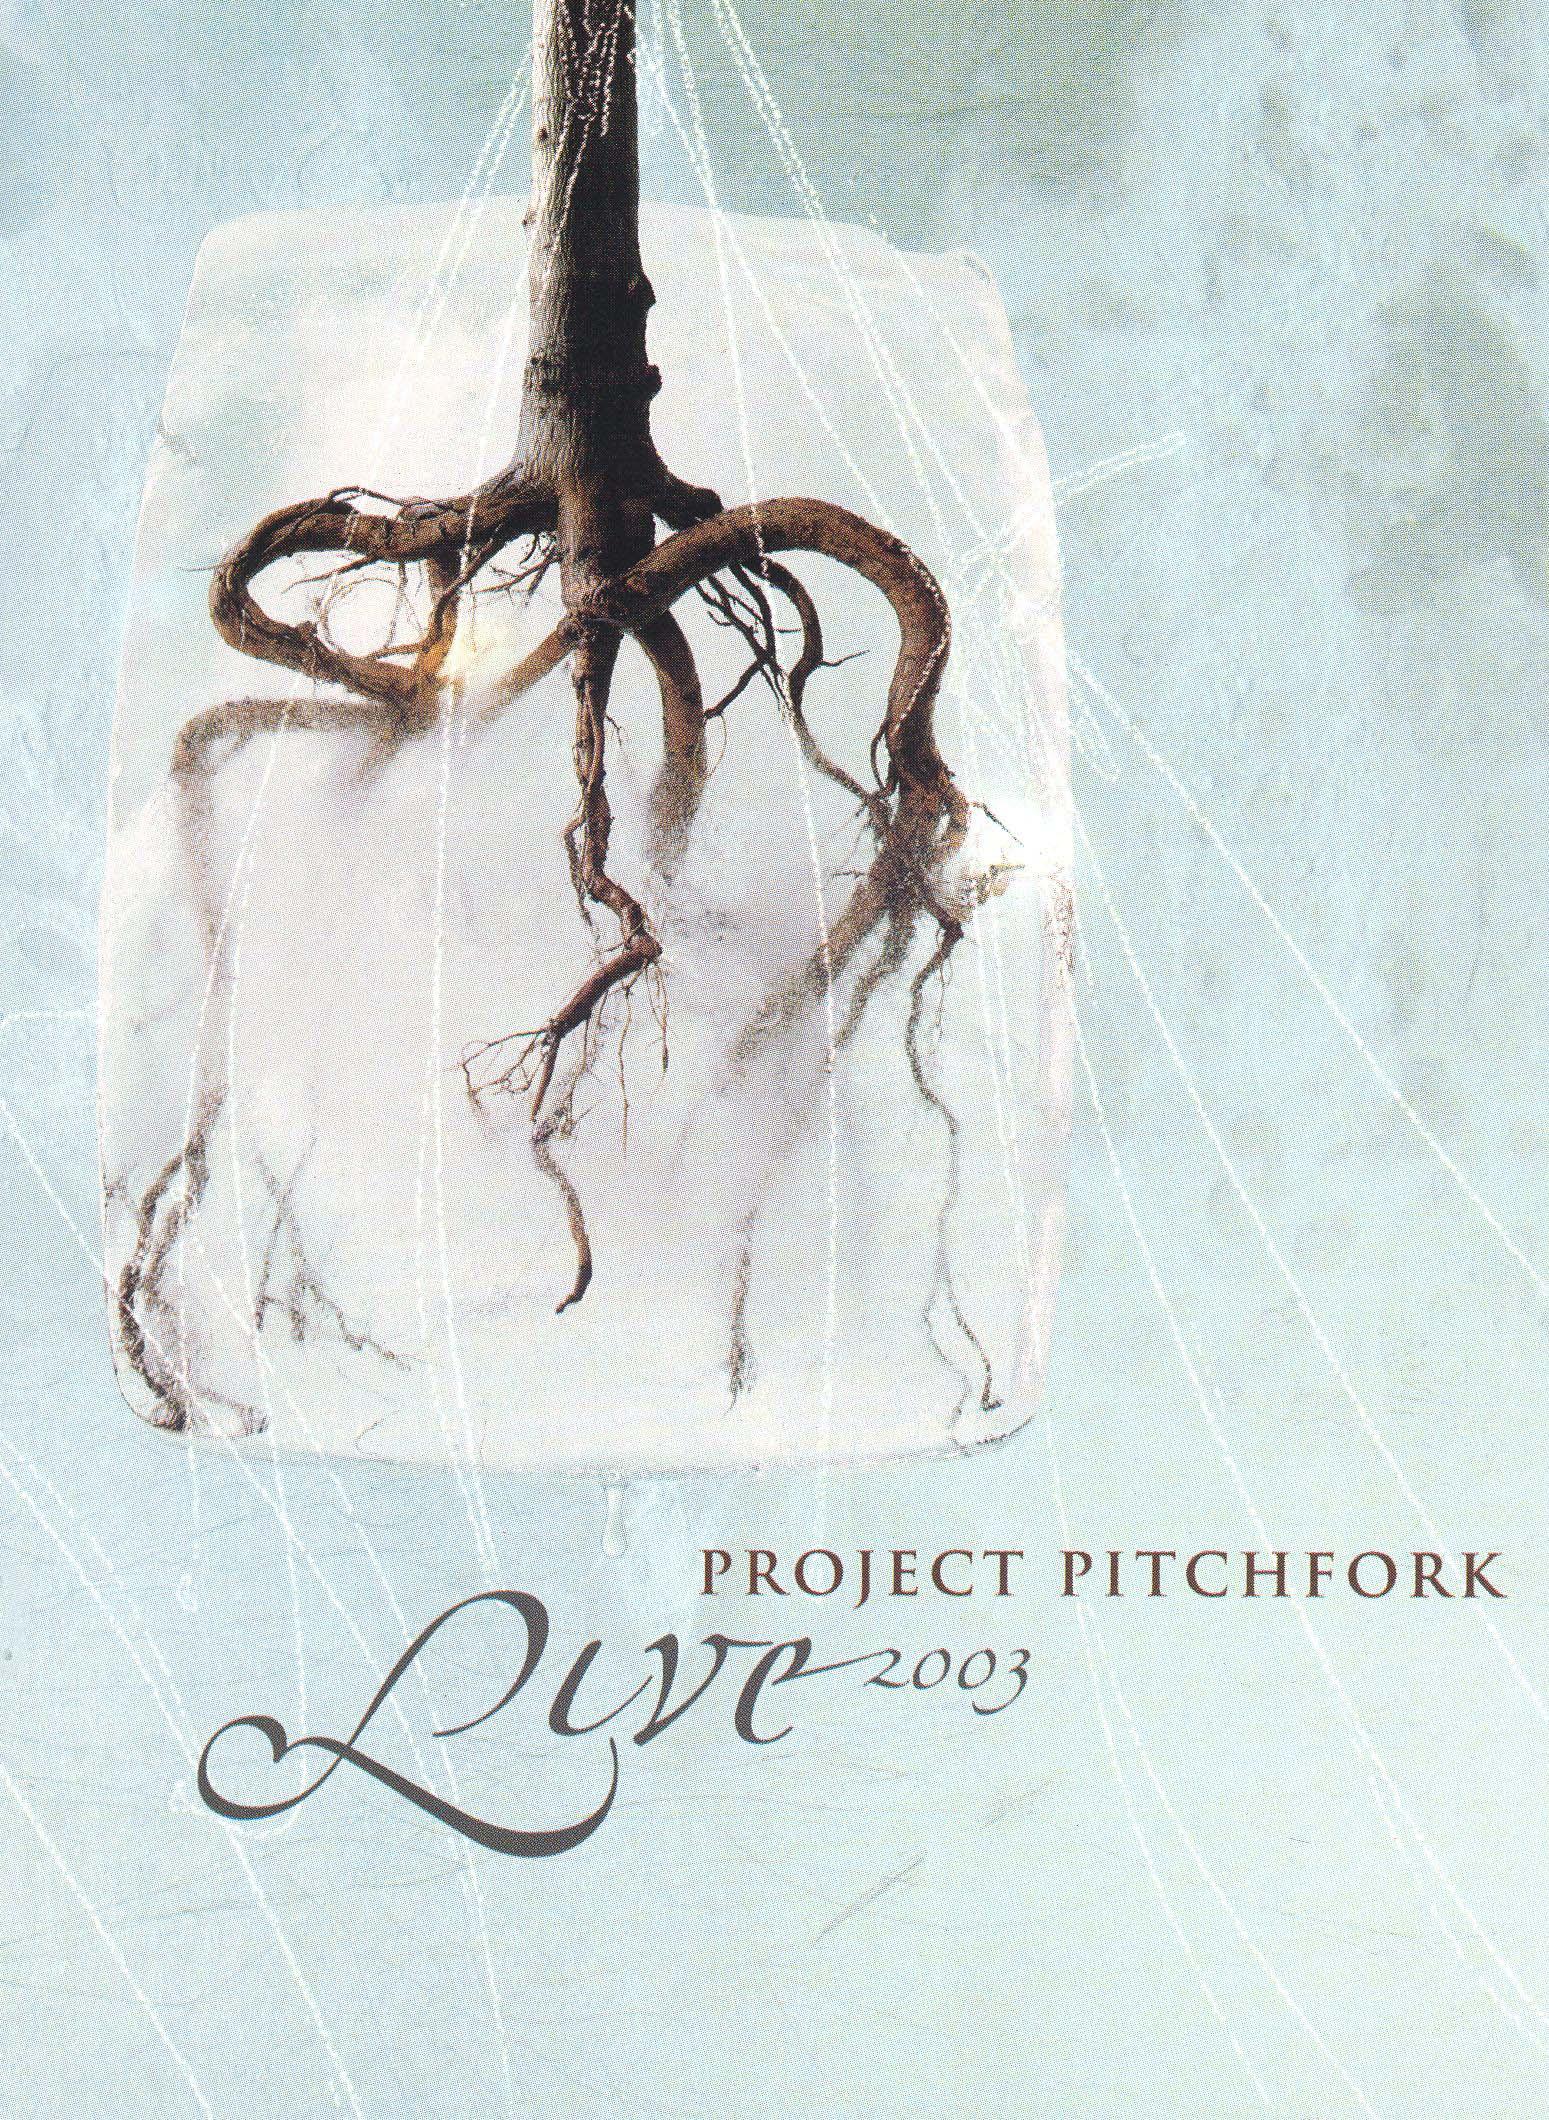 Project Pitchfork: Live 2003